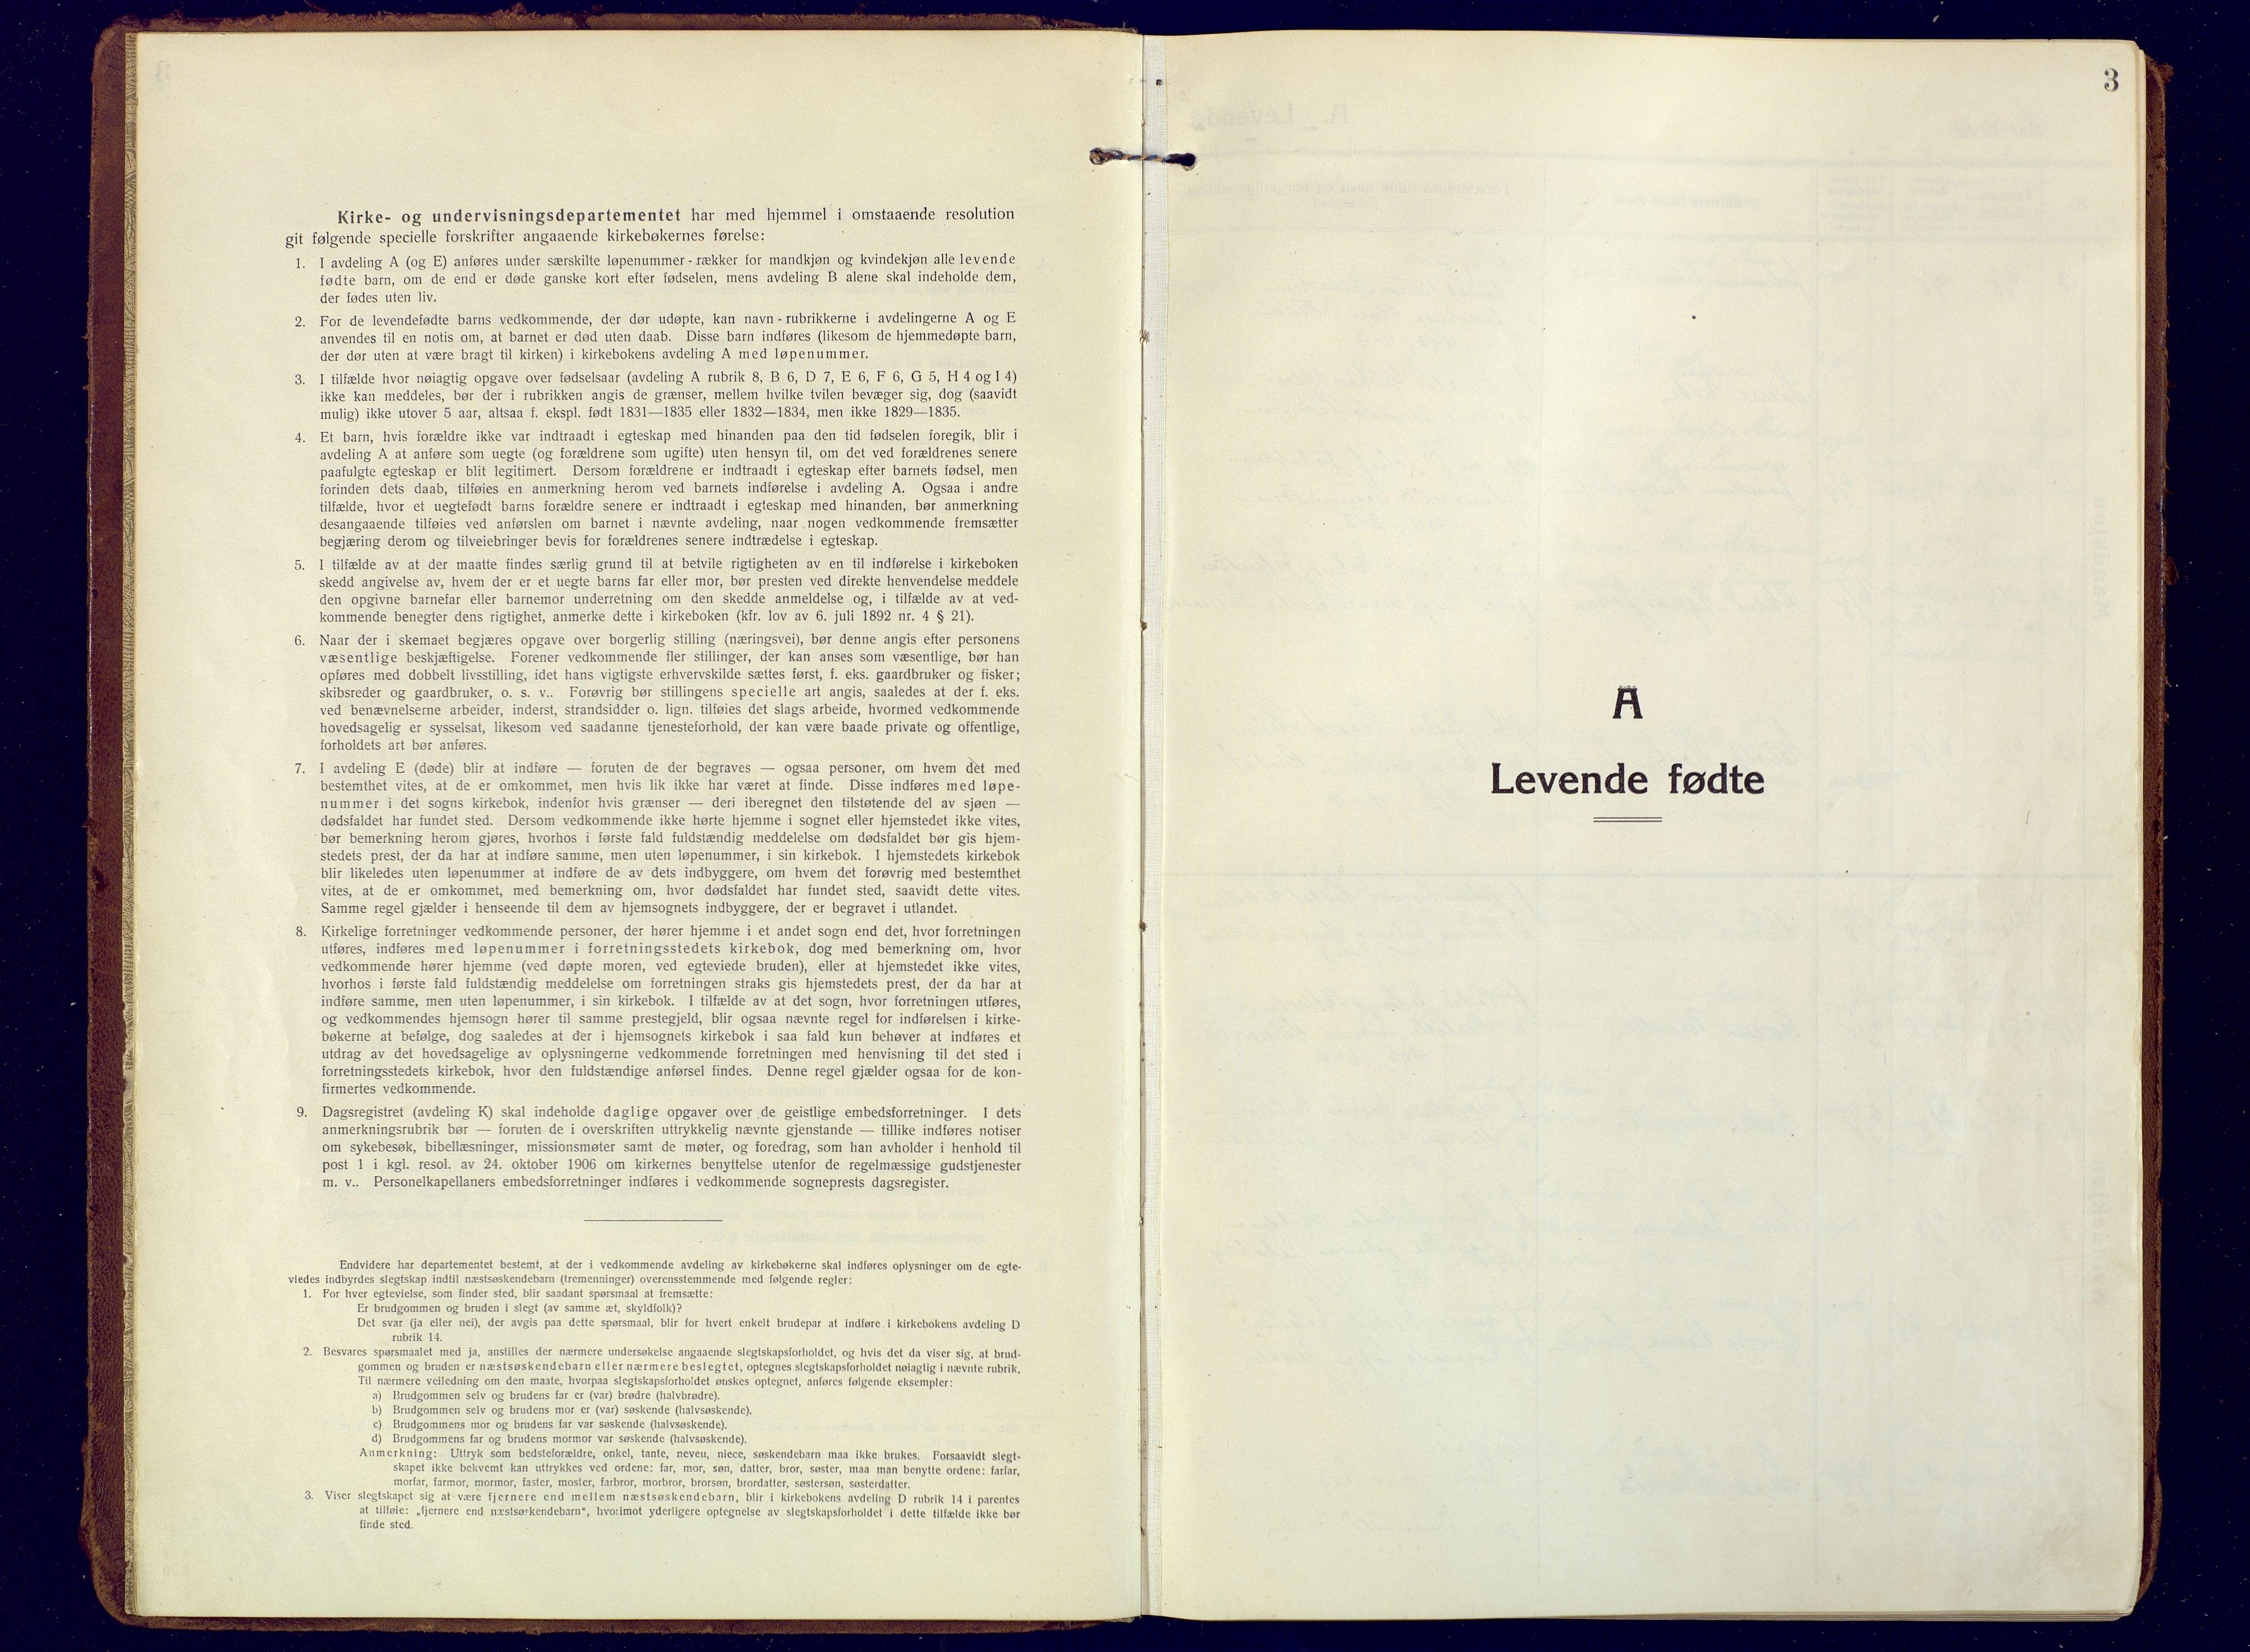 SATØ, Mefjord/Berg sokneprestkontor, G/Ga/Gaa: Ministerialbok nr. 10, 1916-1928, s. 3